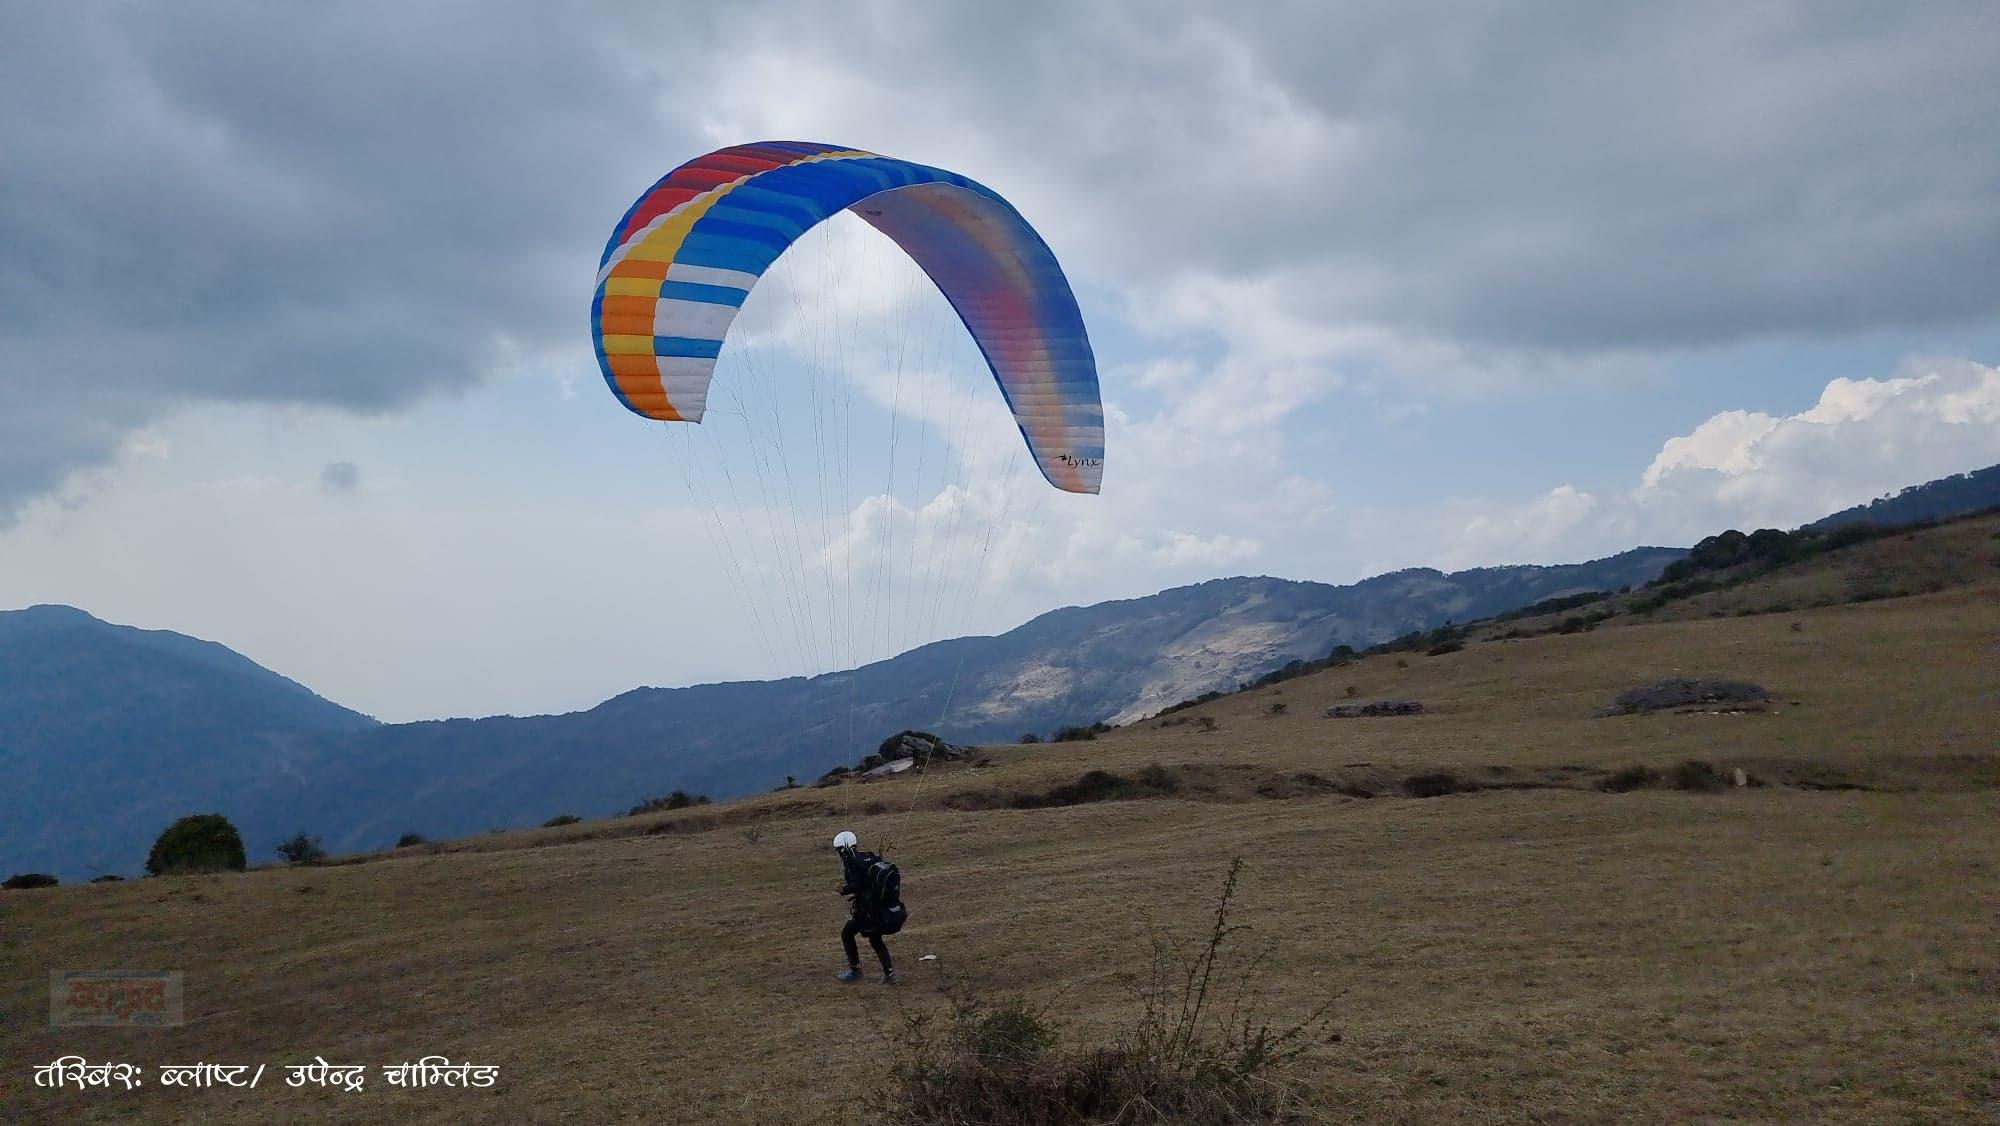 lekhmani_Jimi_Adventure_Park_Upendra_Chamling_Photo3